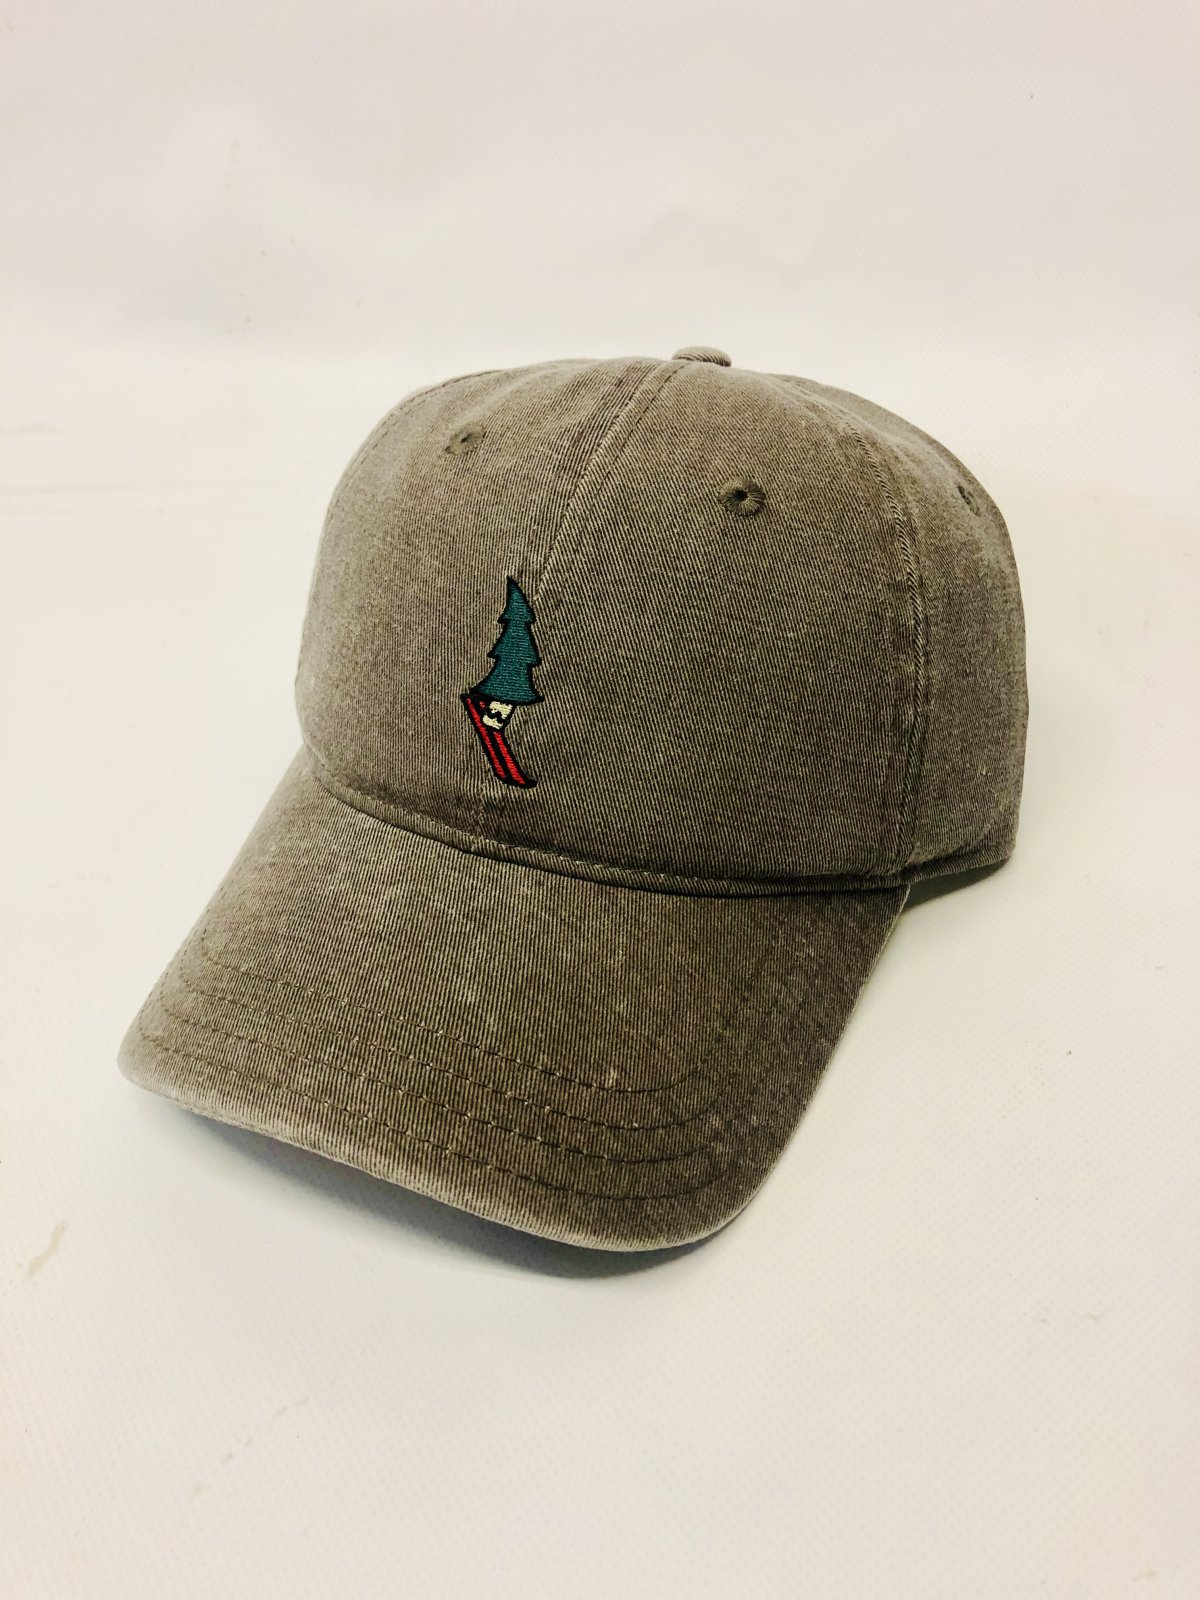 Pine-w-ski's Shop Hat